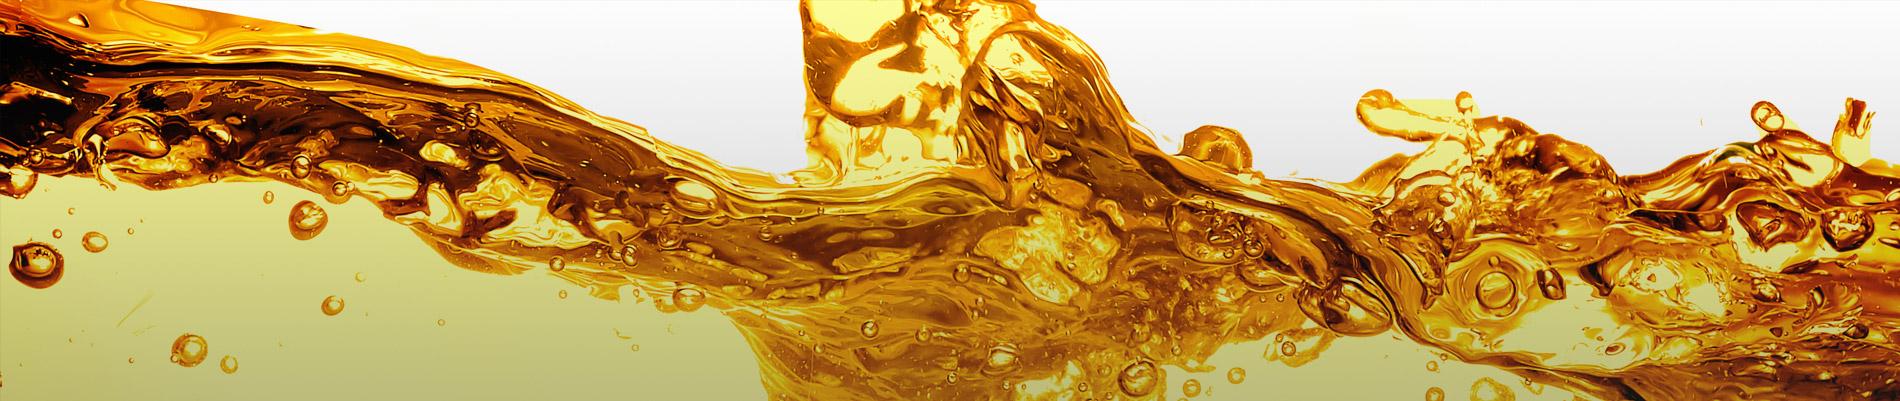 Heizöl Günstig Kaufen Heizöl